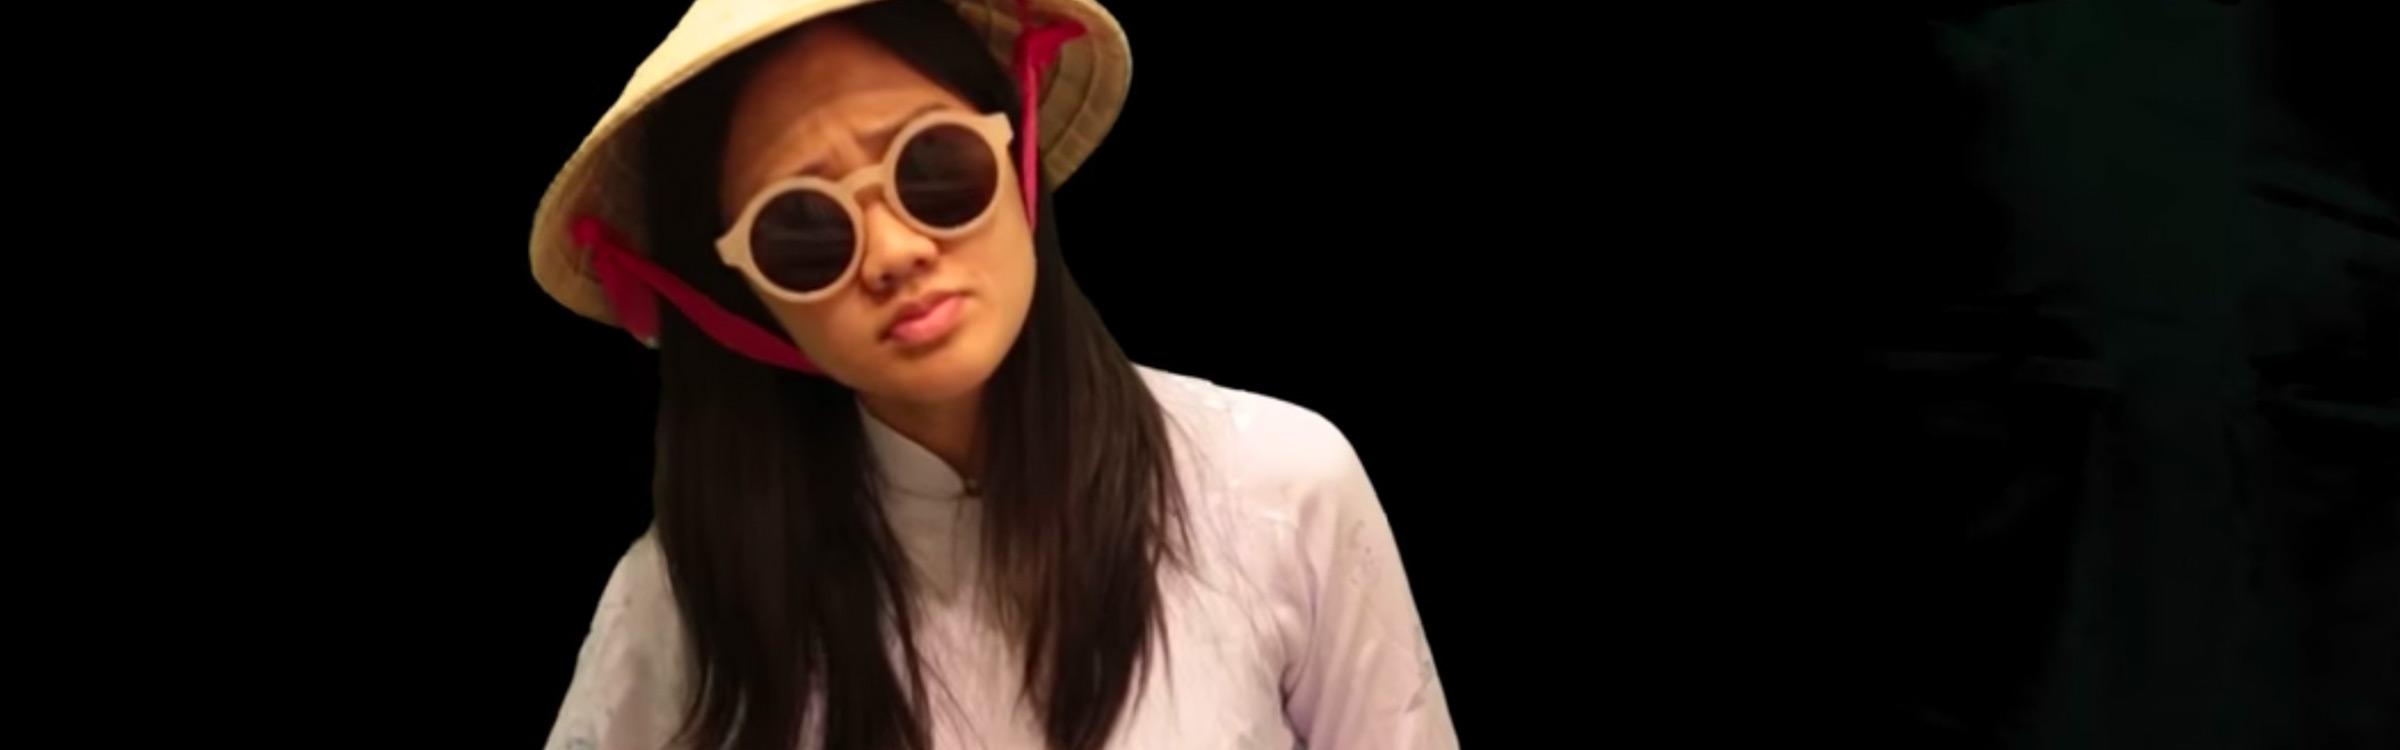 Bieber vietnamees header